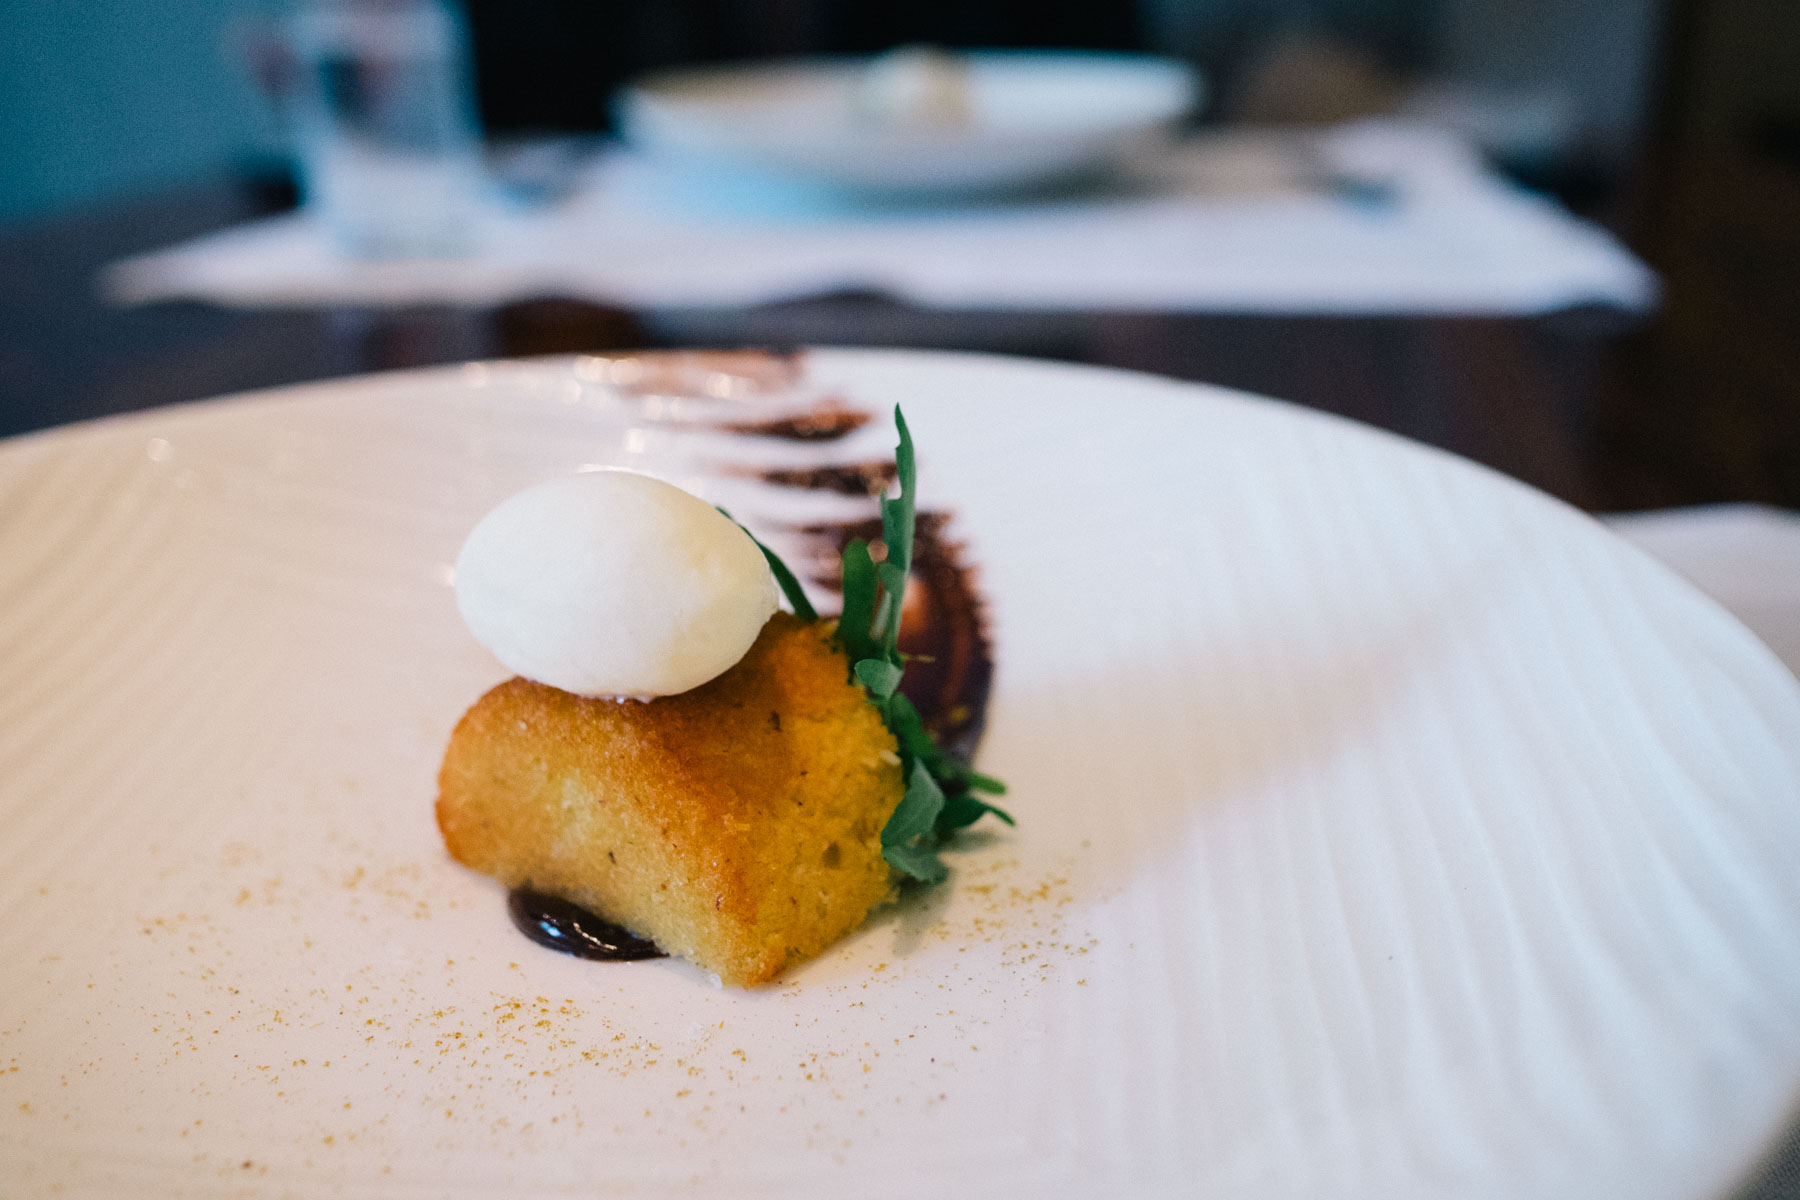 sao-paulo-worlds-best-restaurant-dom-brazil-brasil-michelin-star-22